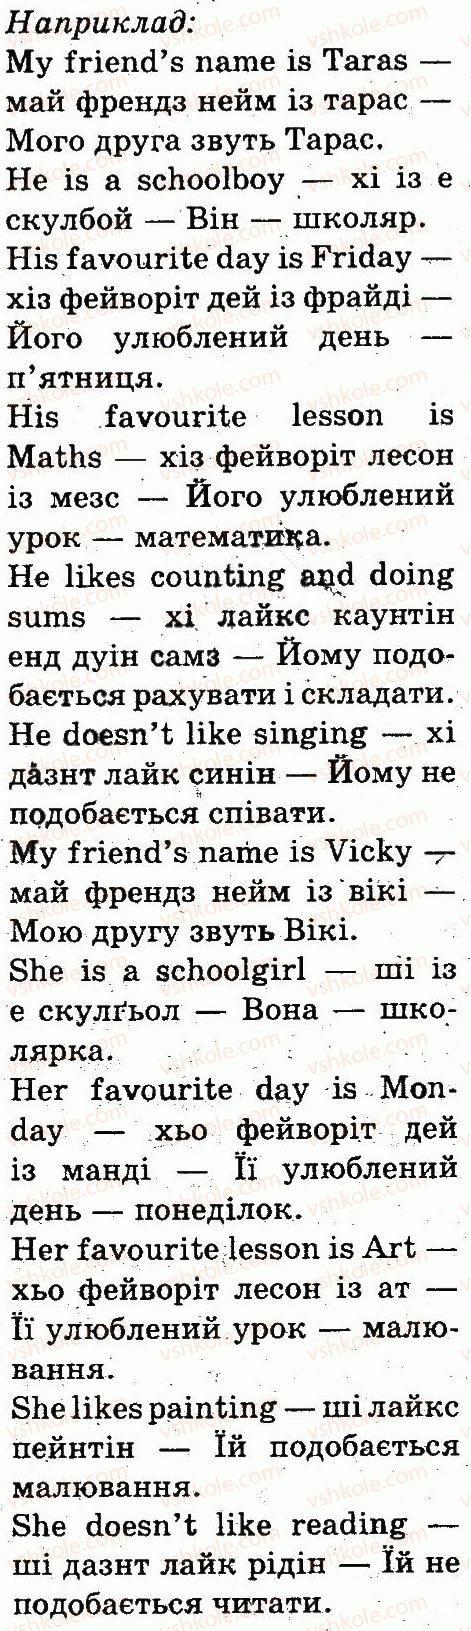 3-anglijska-mova-od-karpyuk-2013--unit-3-welcome-back-to-school-lesson-4-3-rnd3331.jpg